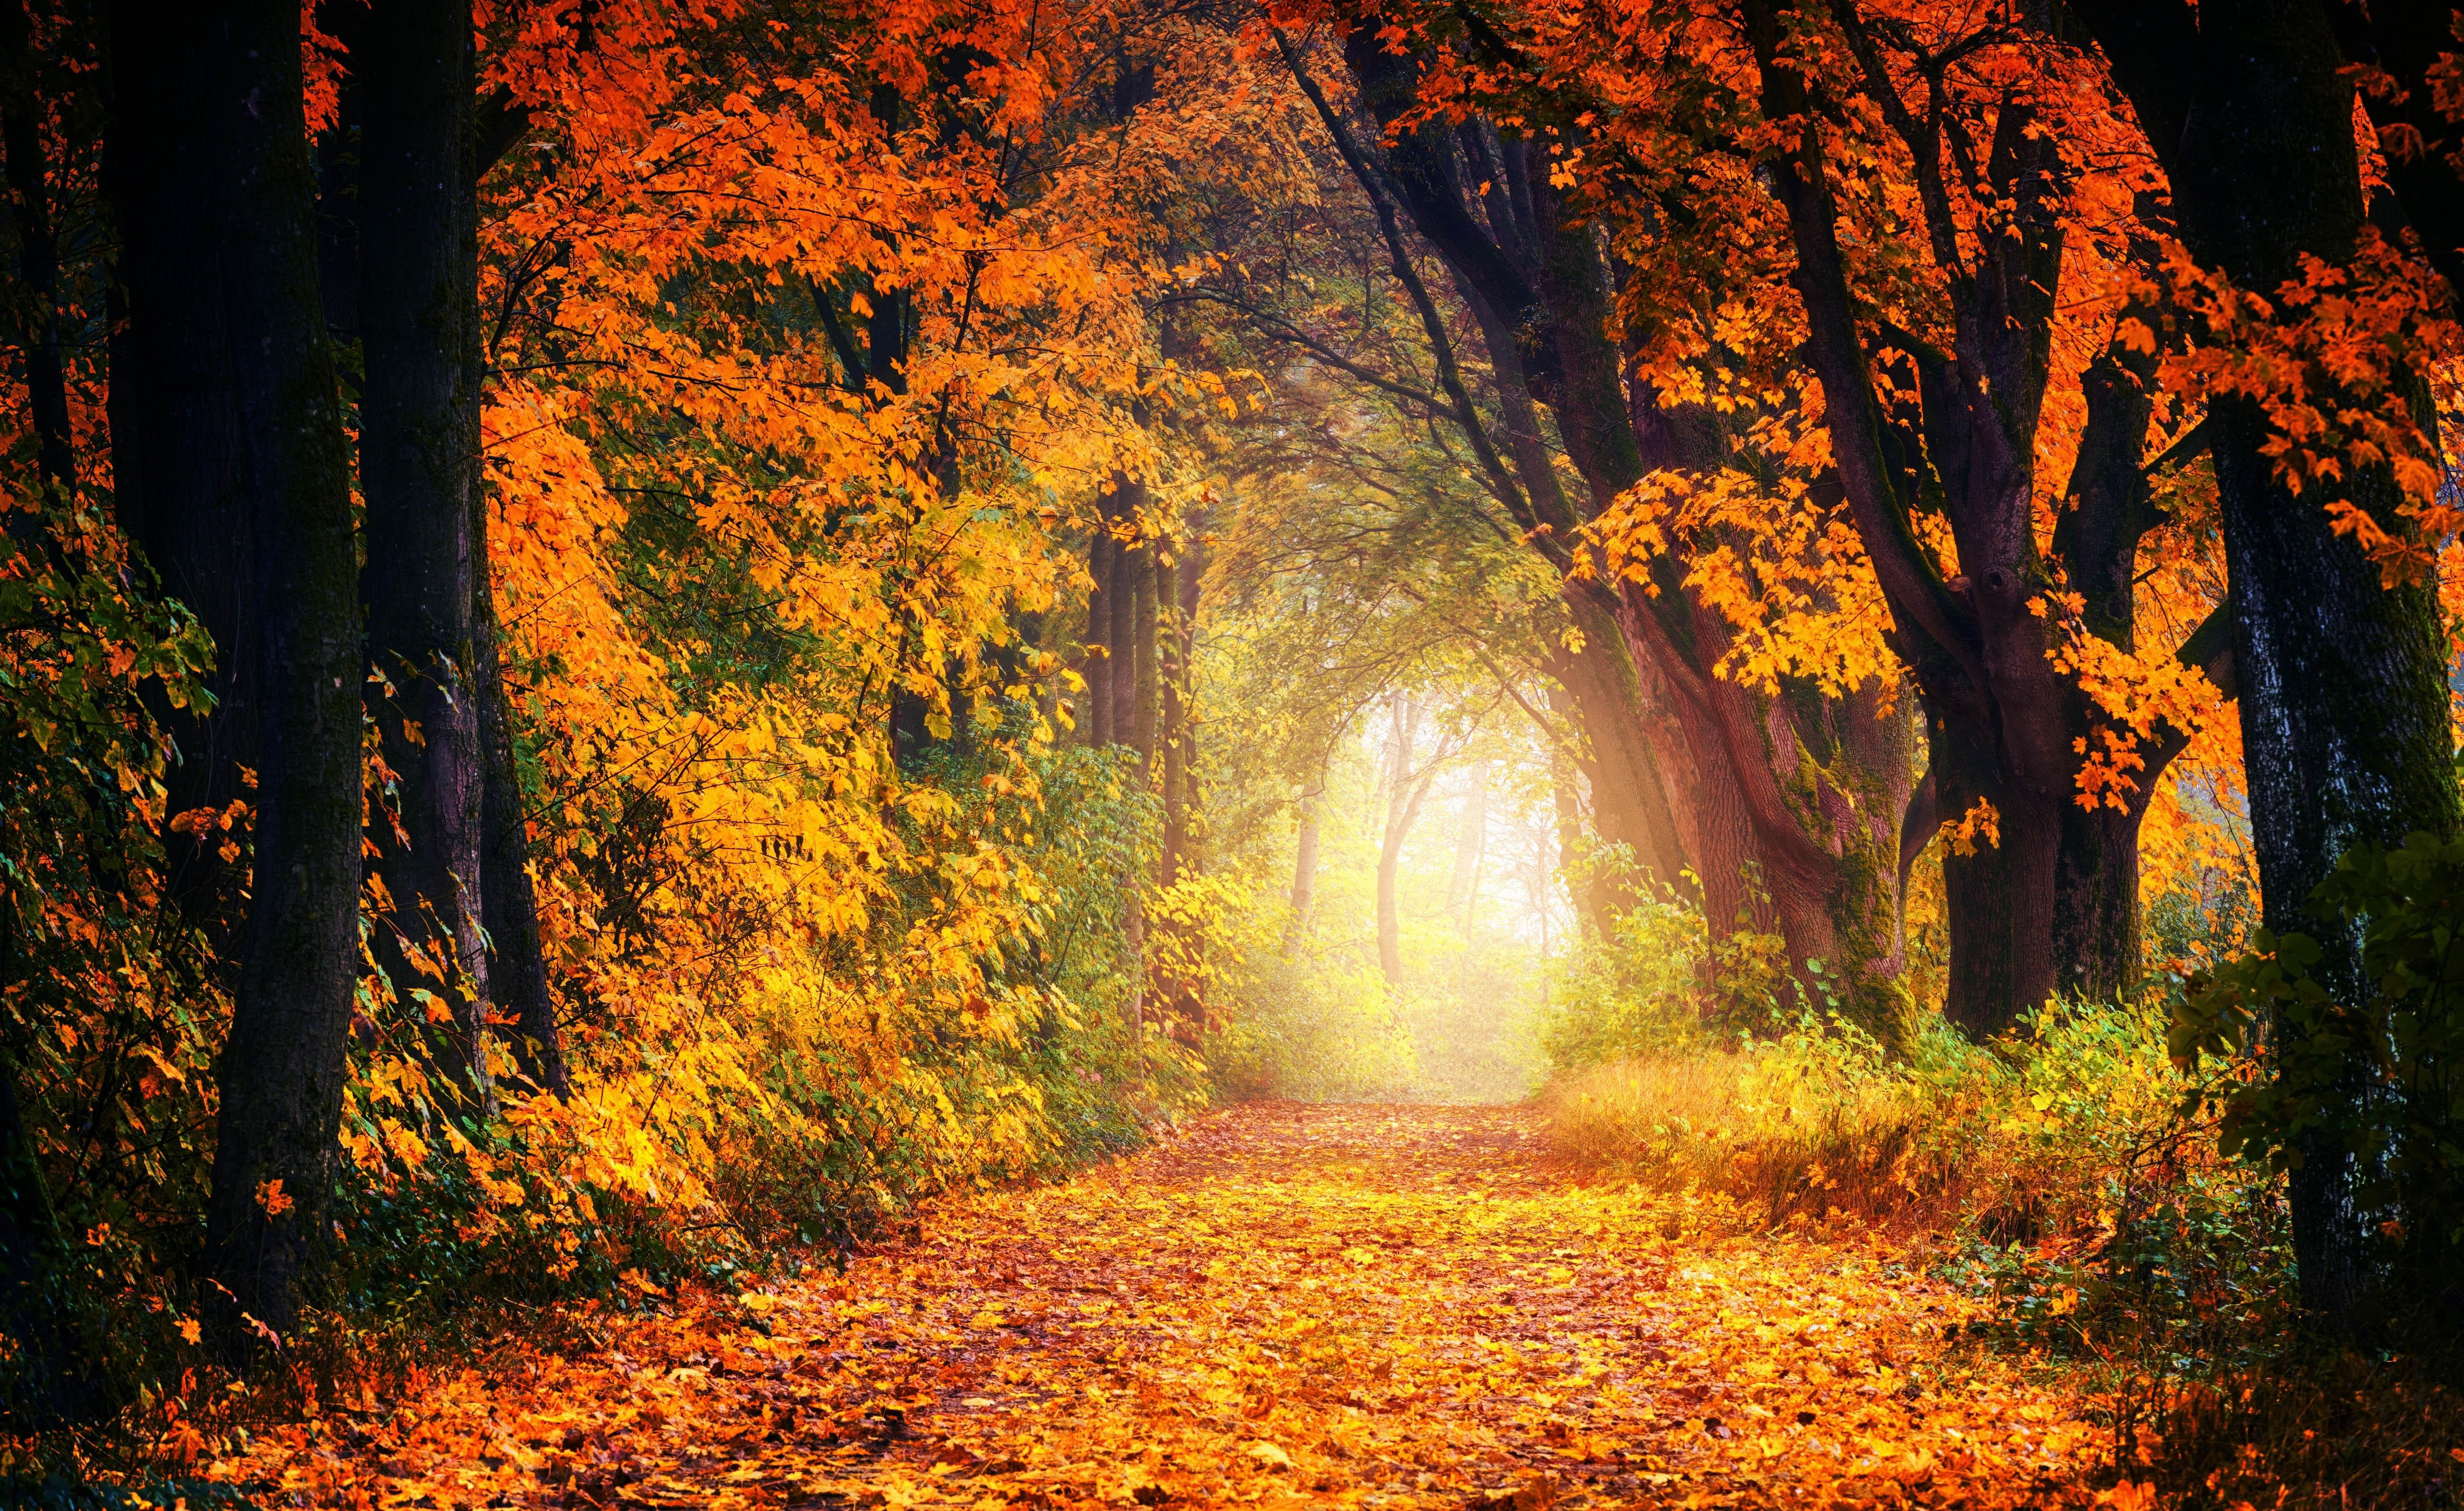 осень, деревья, арка, туннель, 5k